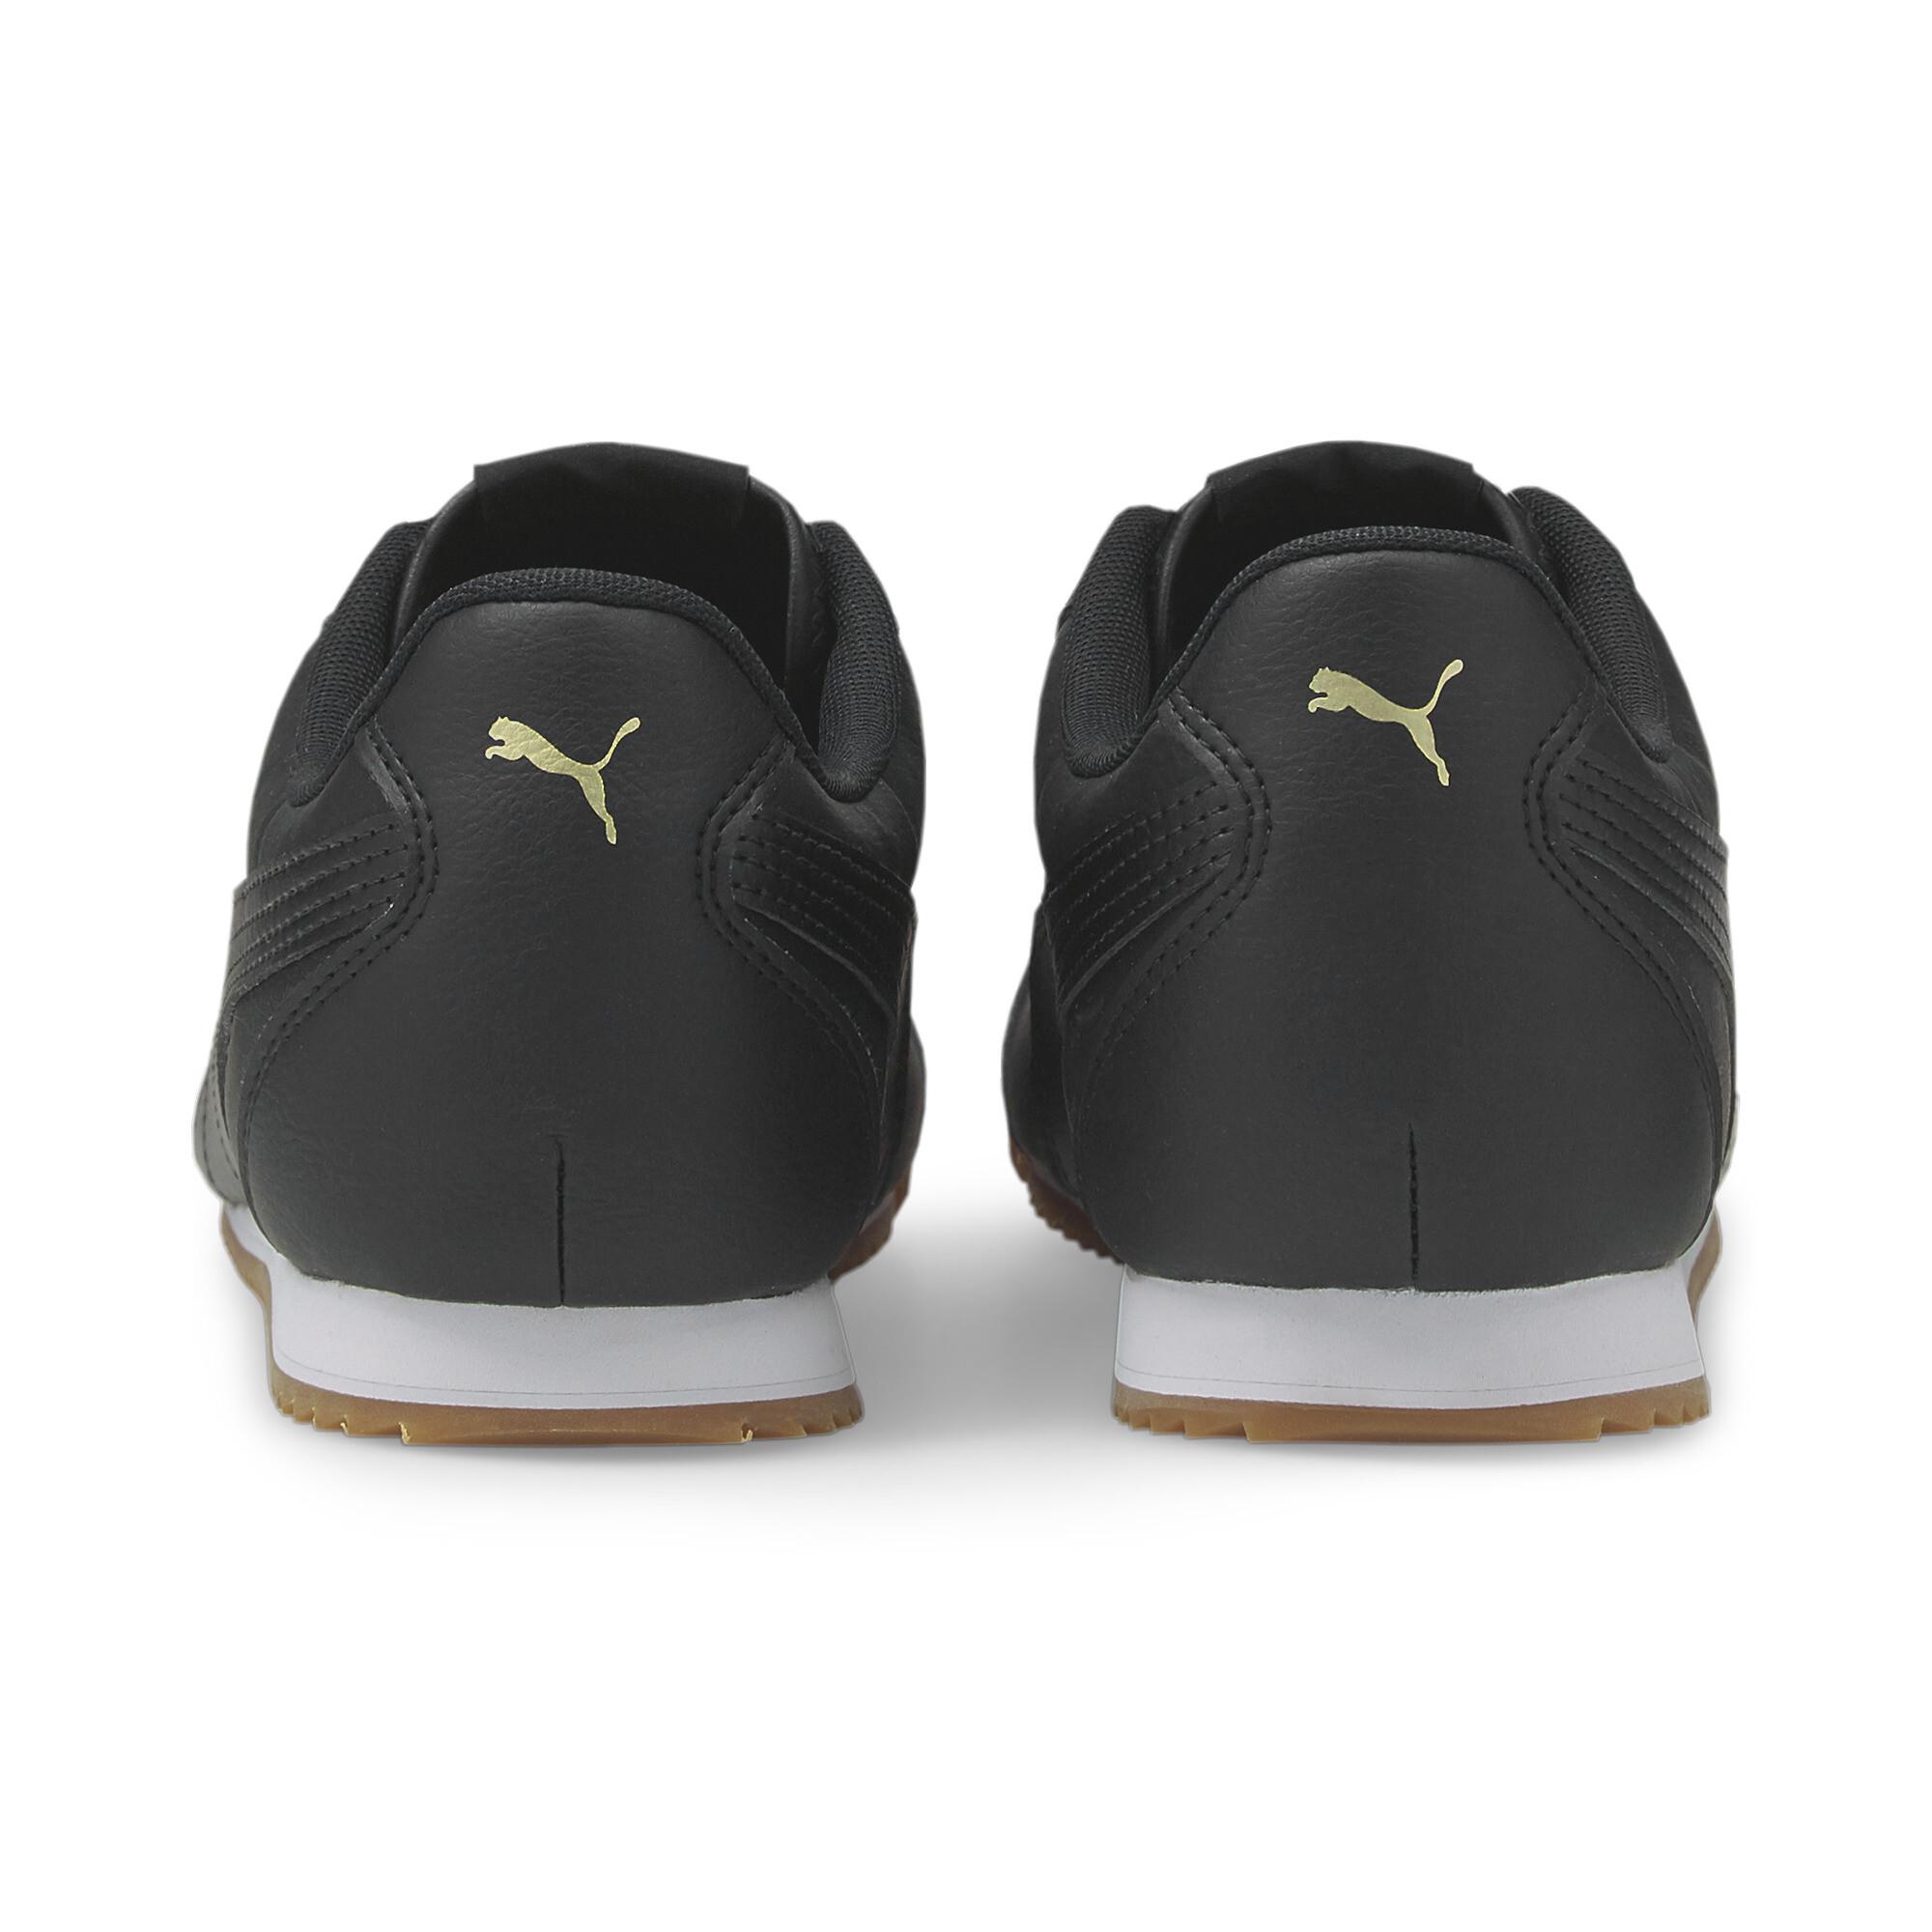 thumbnail 6 - PUMA Men's Turino SL Sneakers